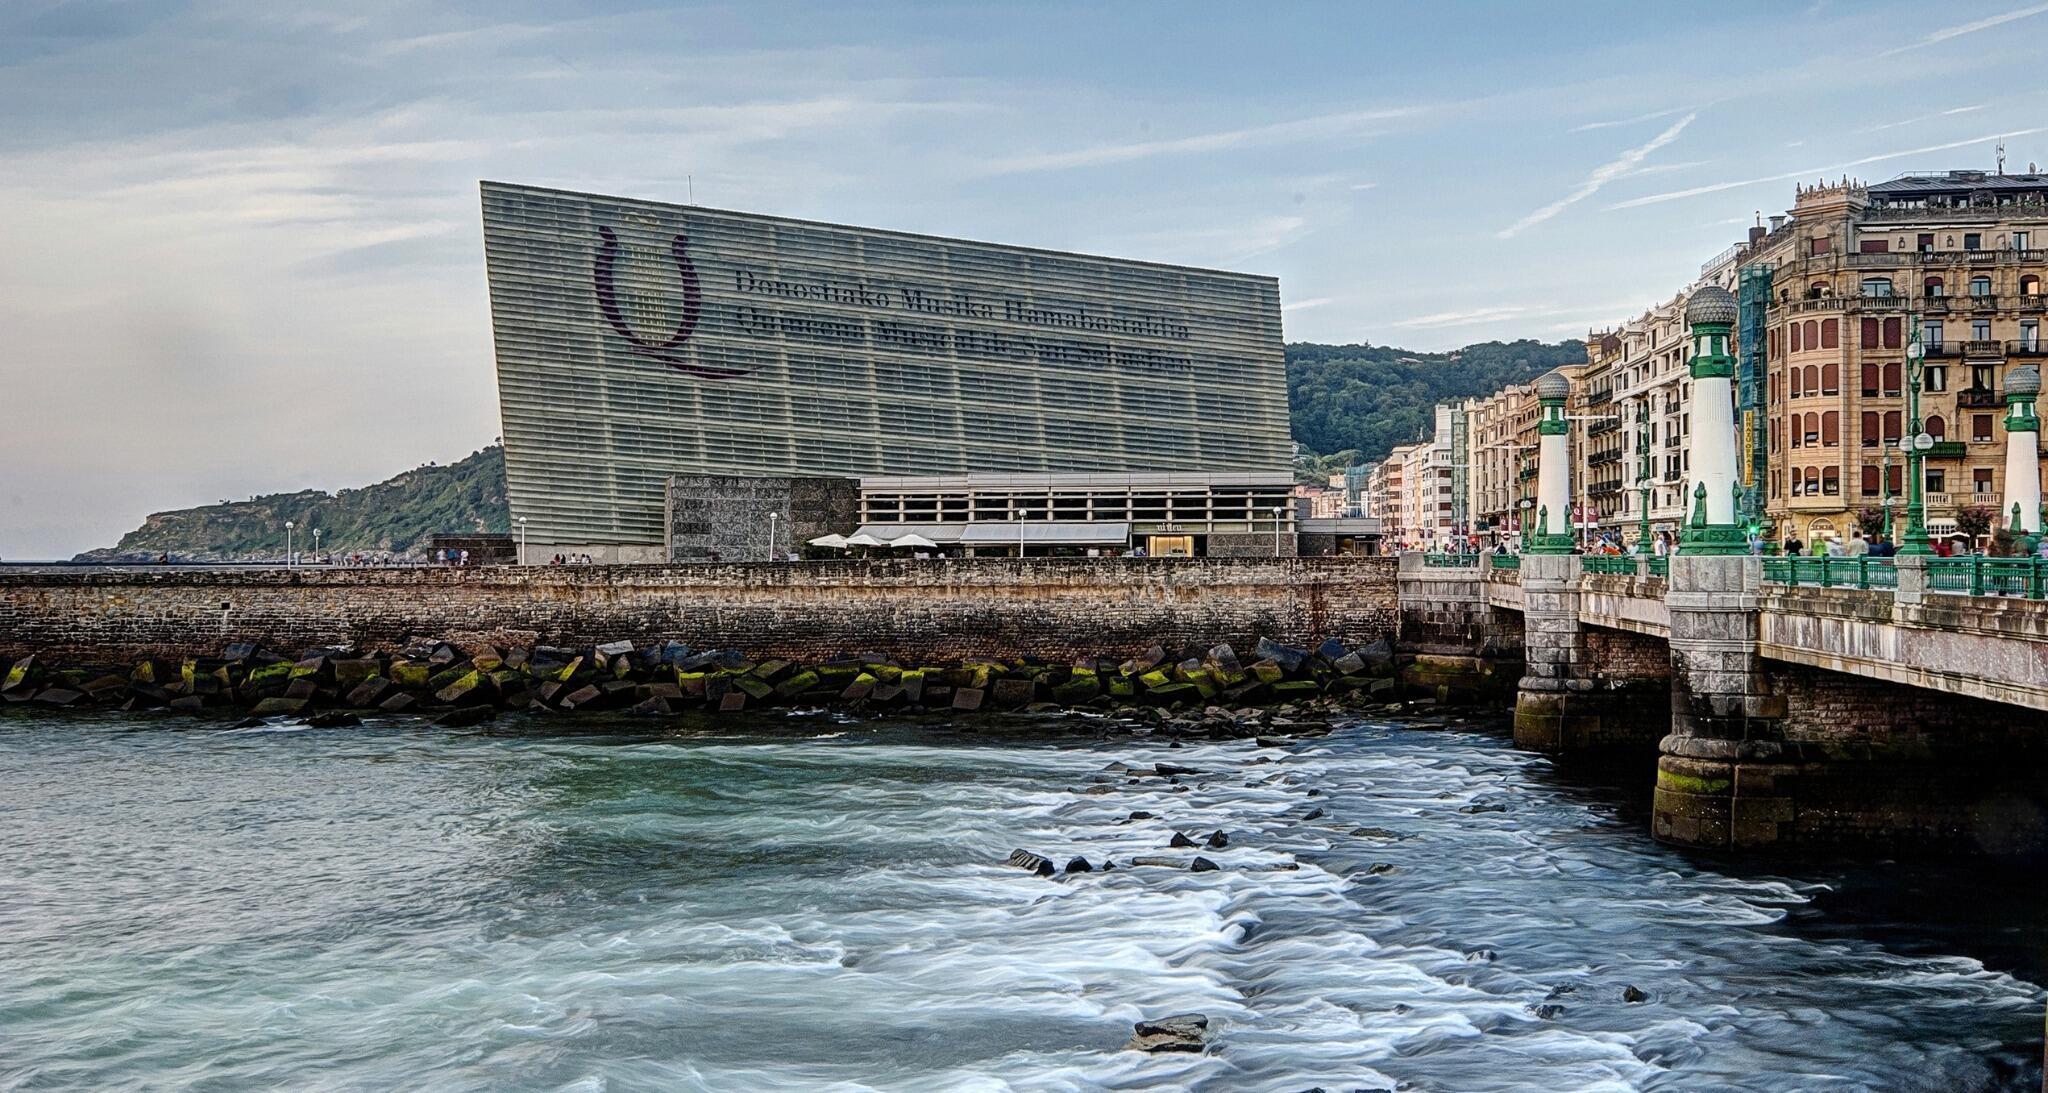 7.- Tramo Hondarribia-Donostia para EuskadienBTT BJNPMMLCAAAgKlV